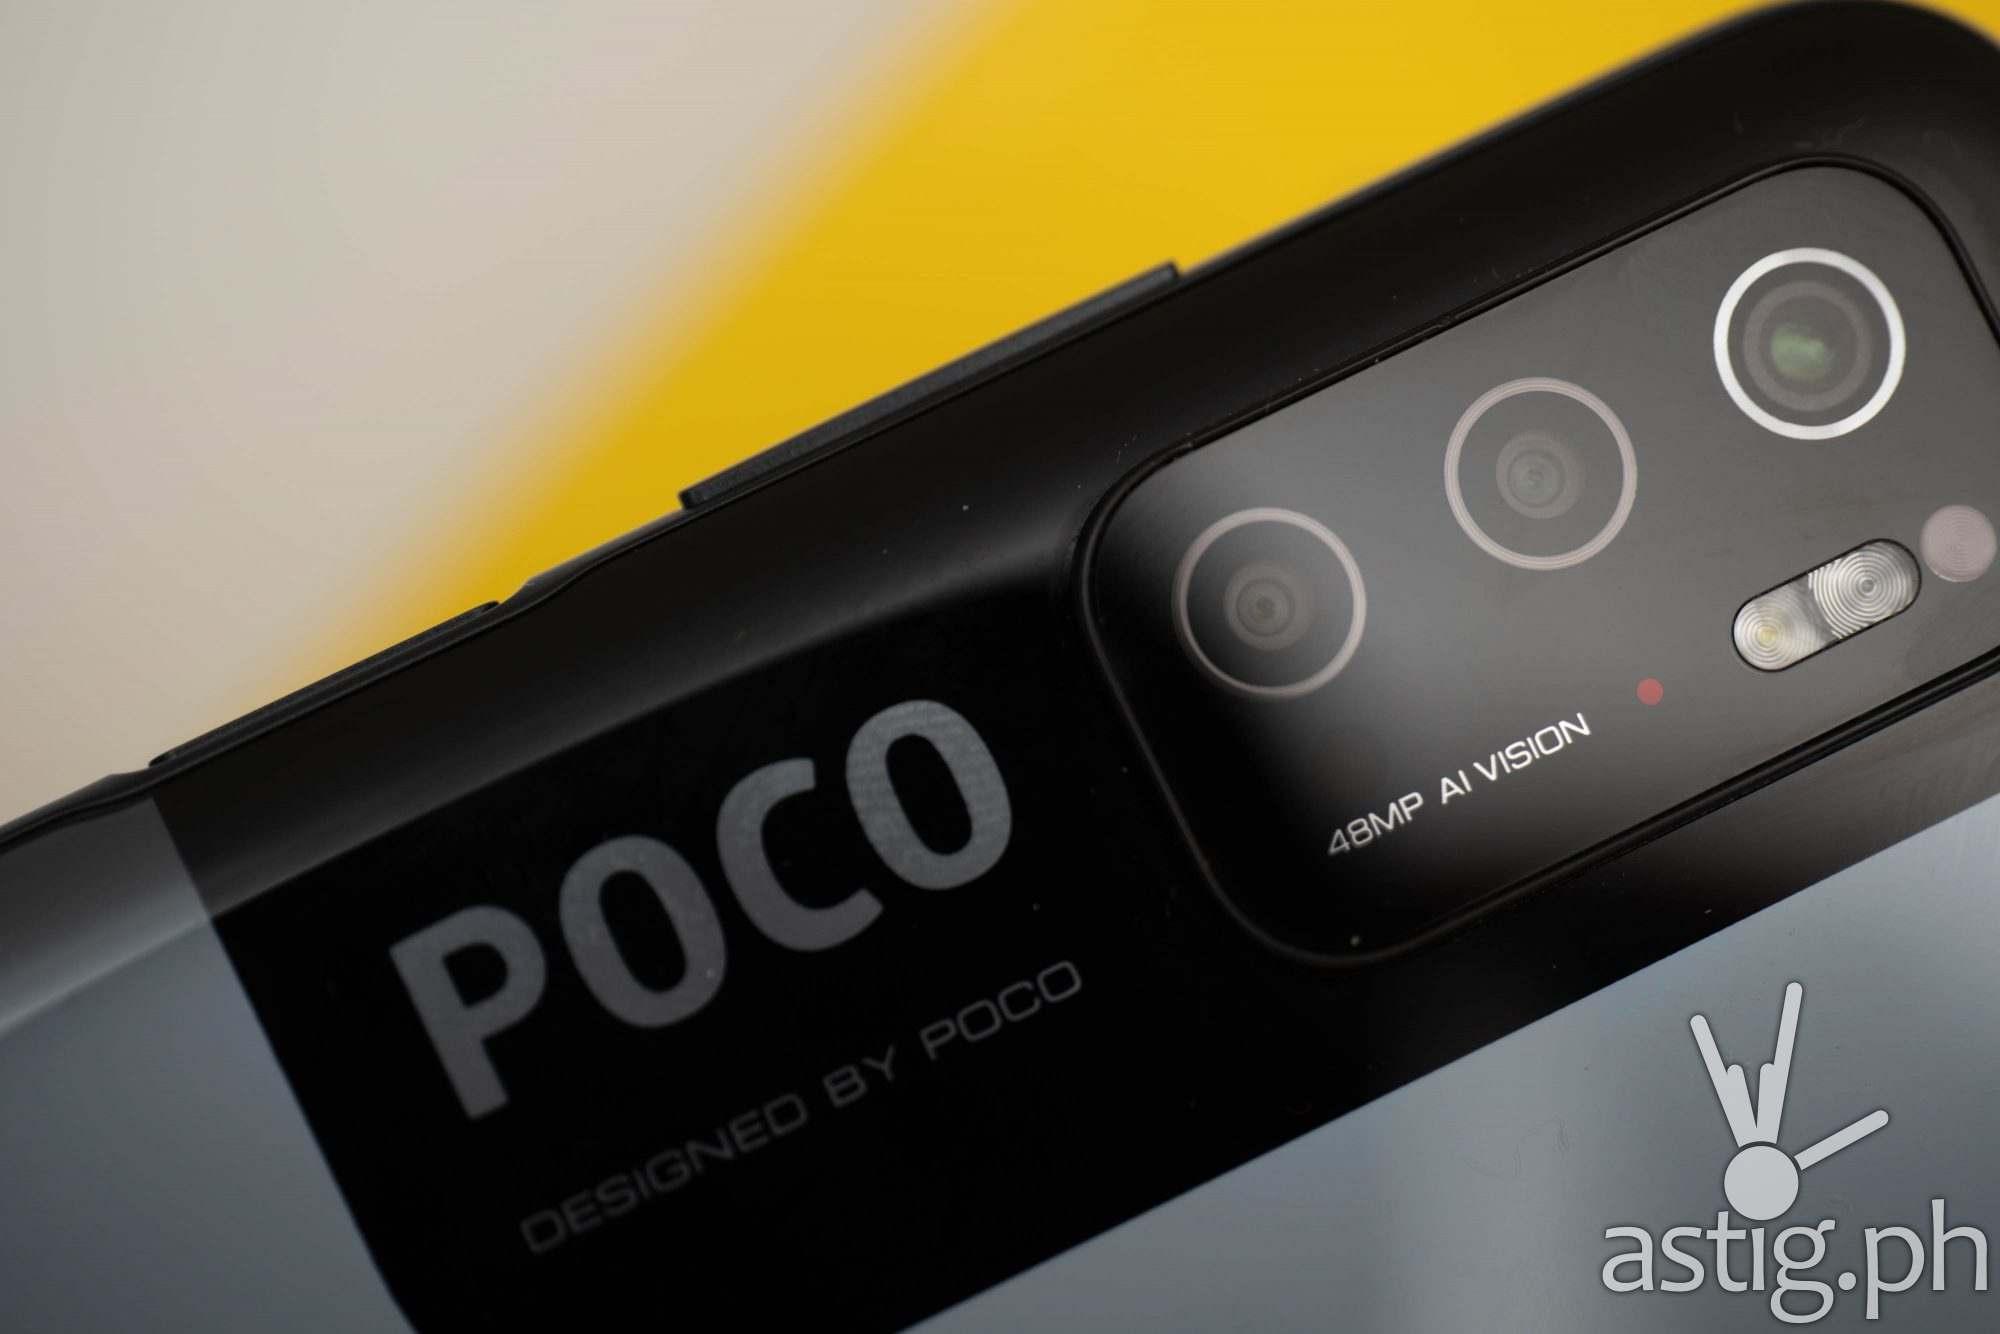 Camera module closeup - POCO M3 Pro 5G (Philippines)